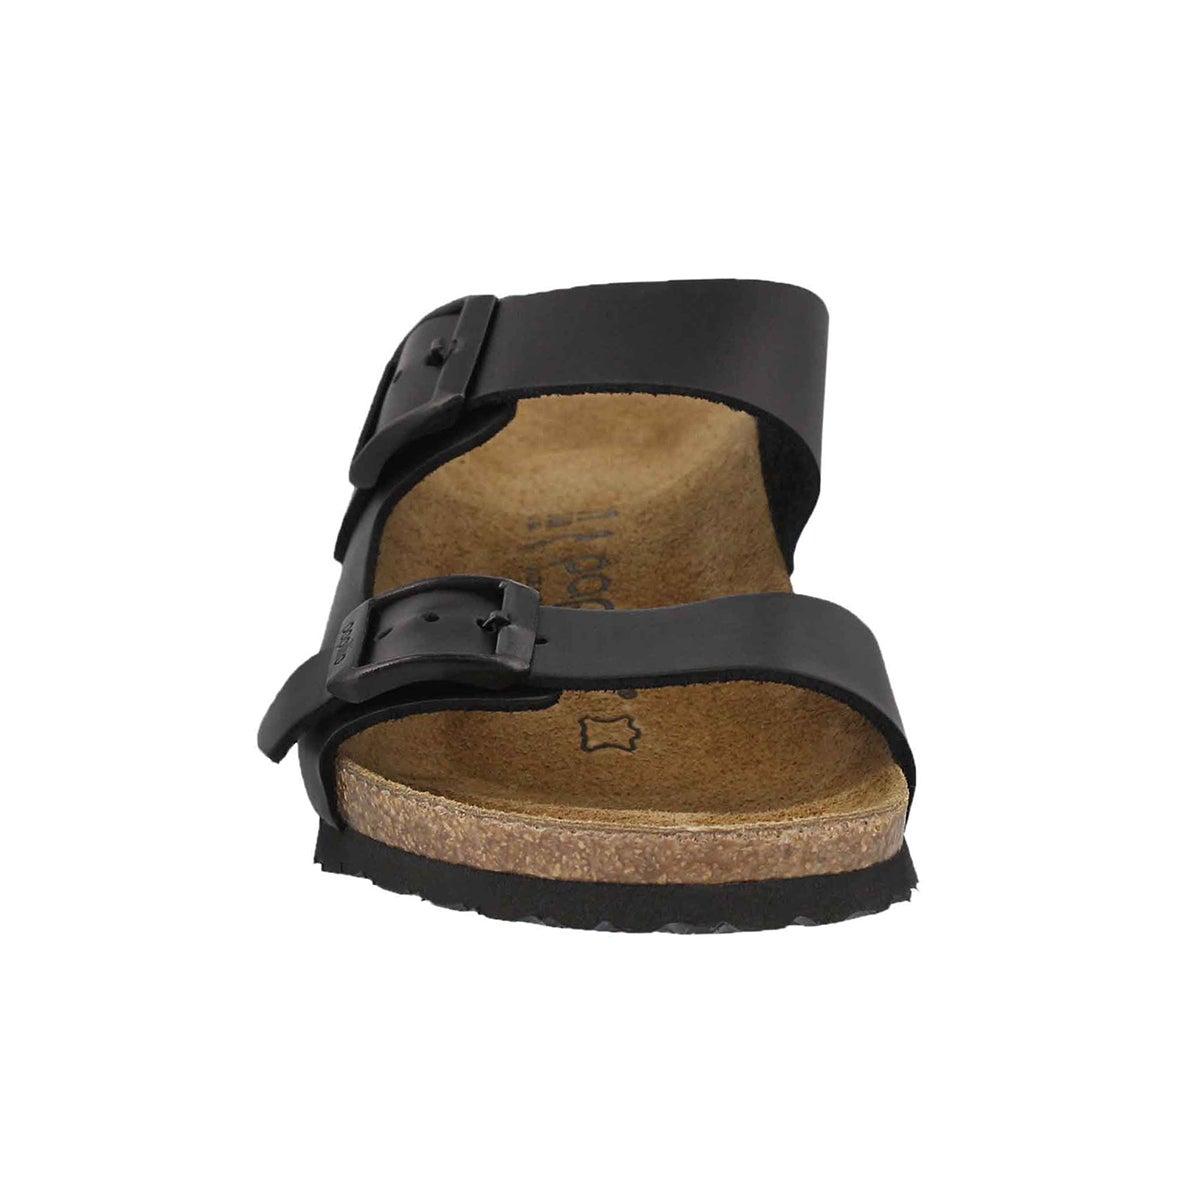 Lds Emina LTR black wedge sandal-N